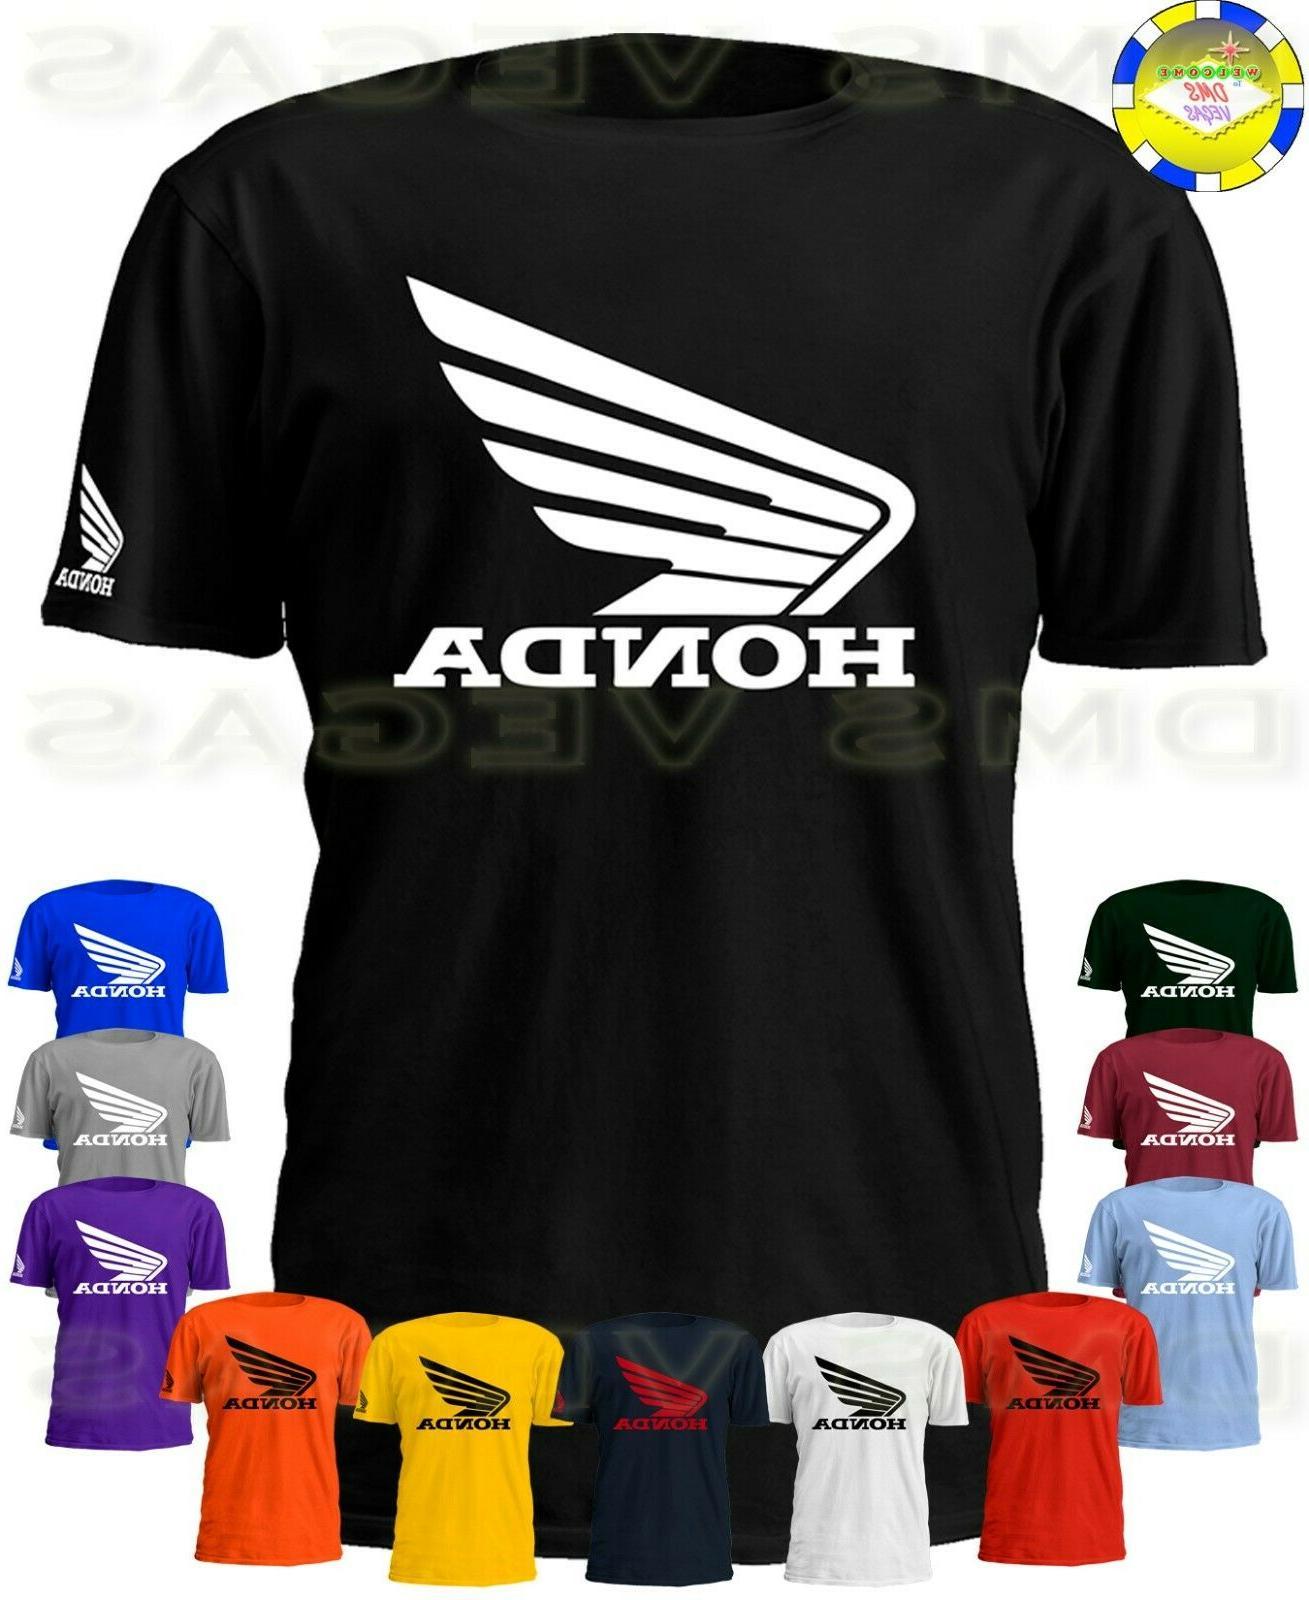 honda racing motorcycle atv wing logo tee